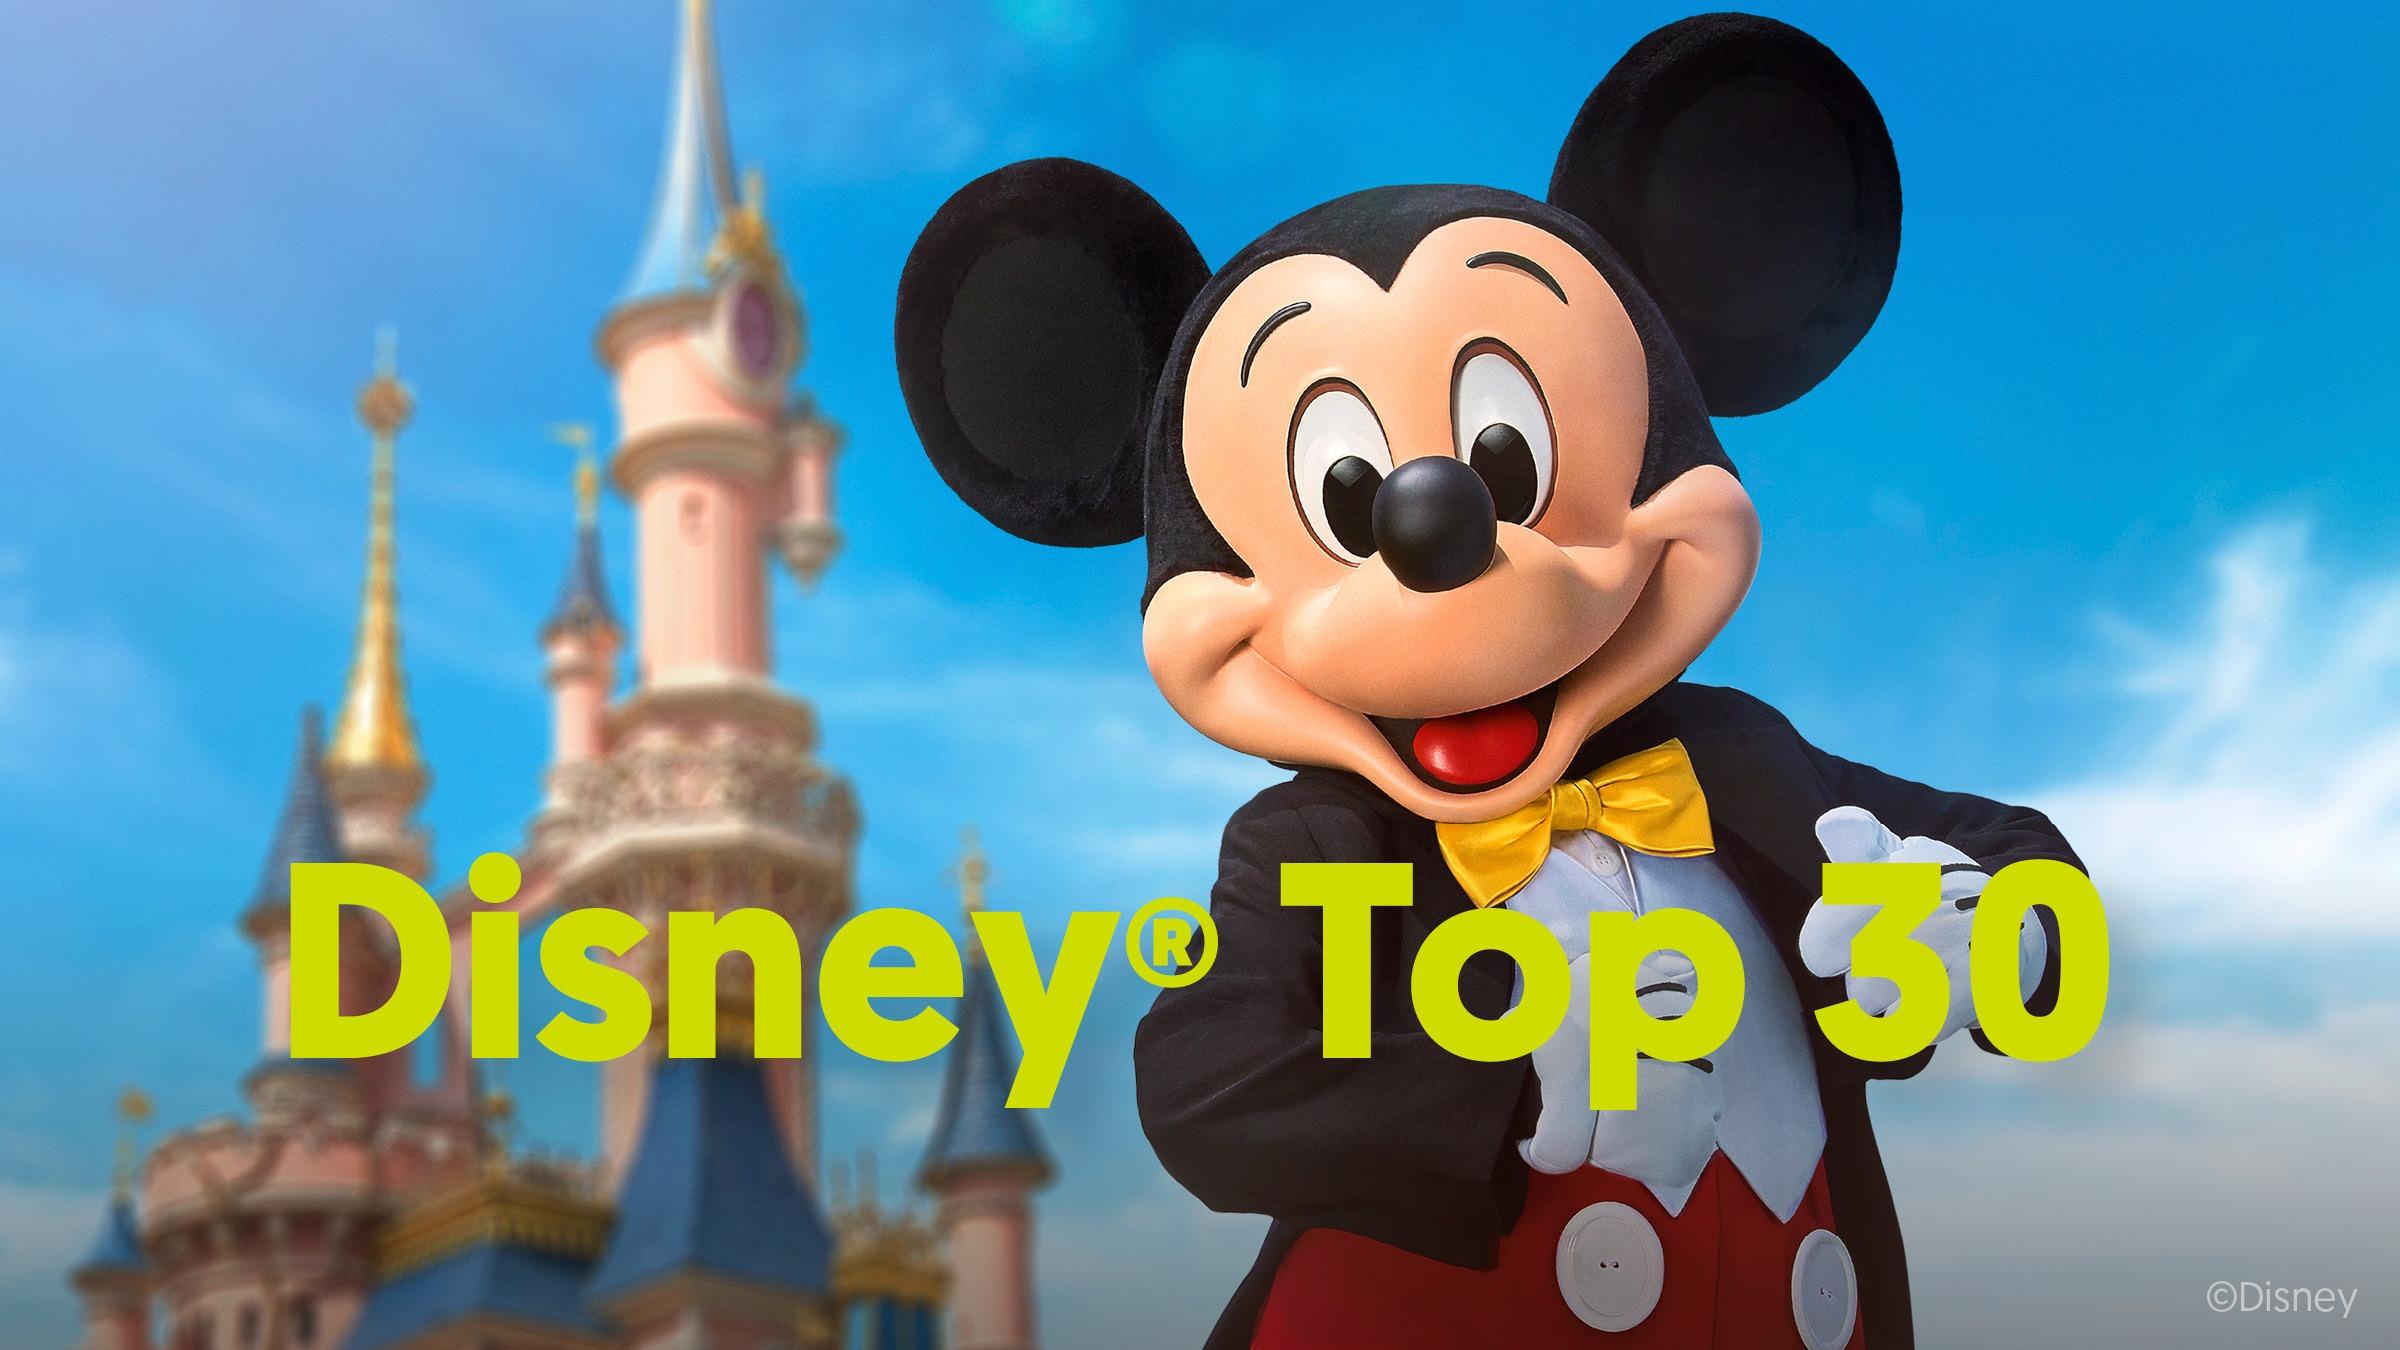 Disney top 30   aankondiging